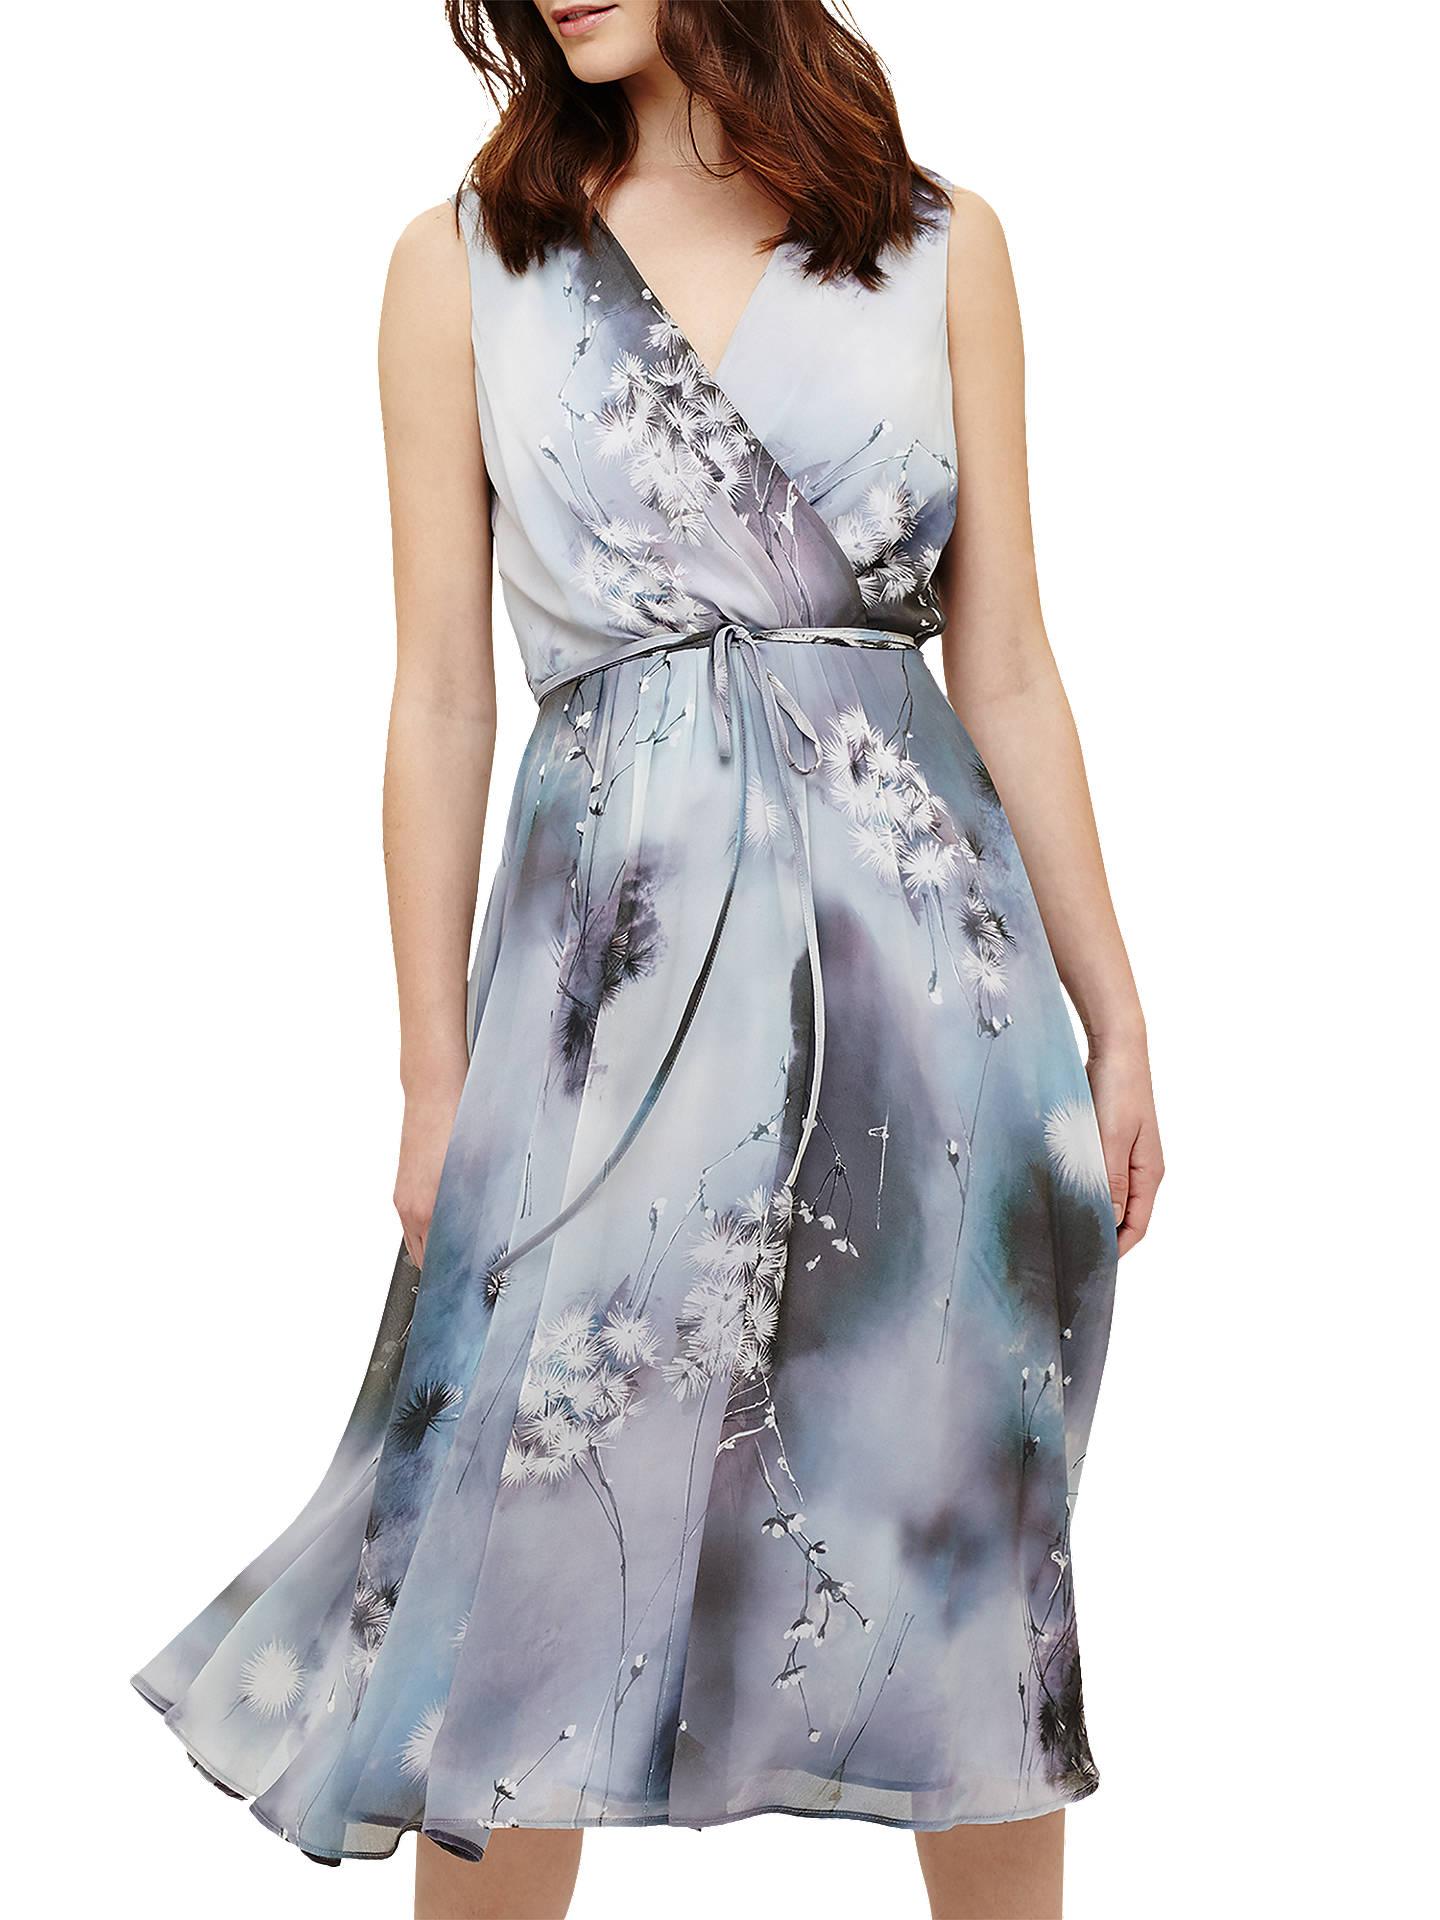 Phase Eight Dandelion Print Dress Blue Multi At John Lewis Partners